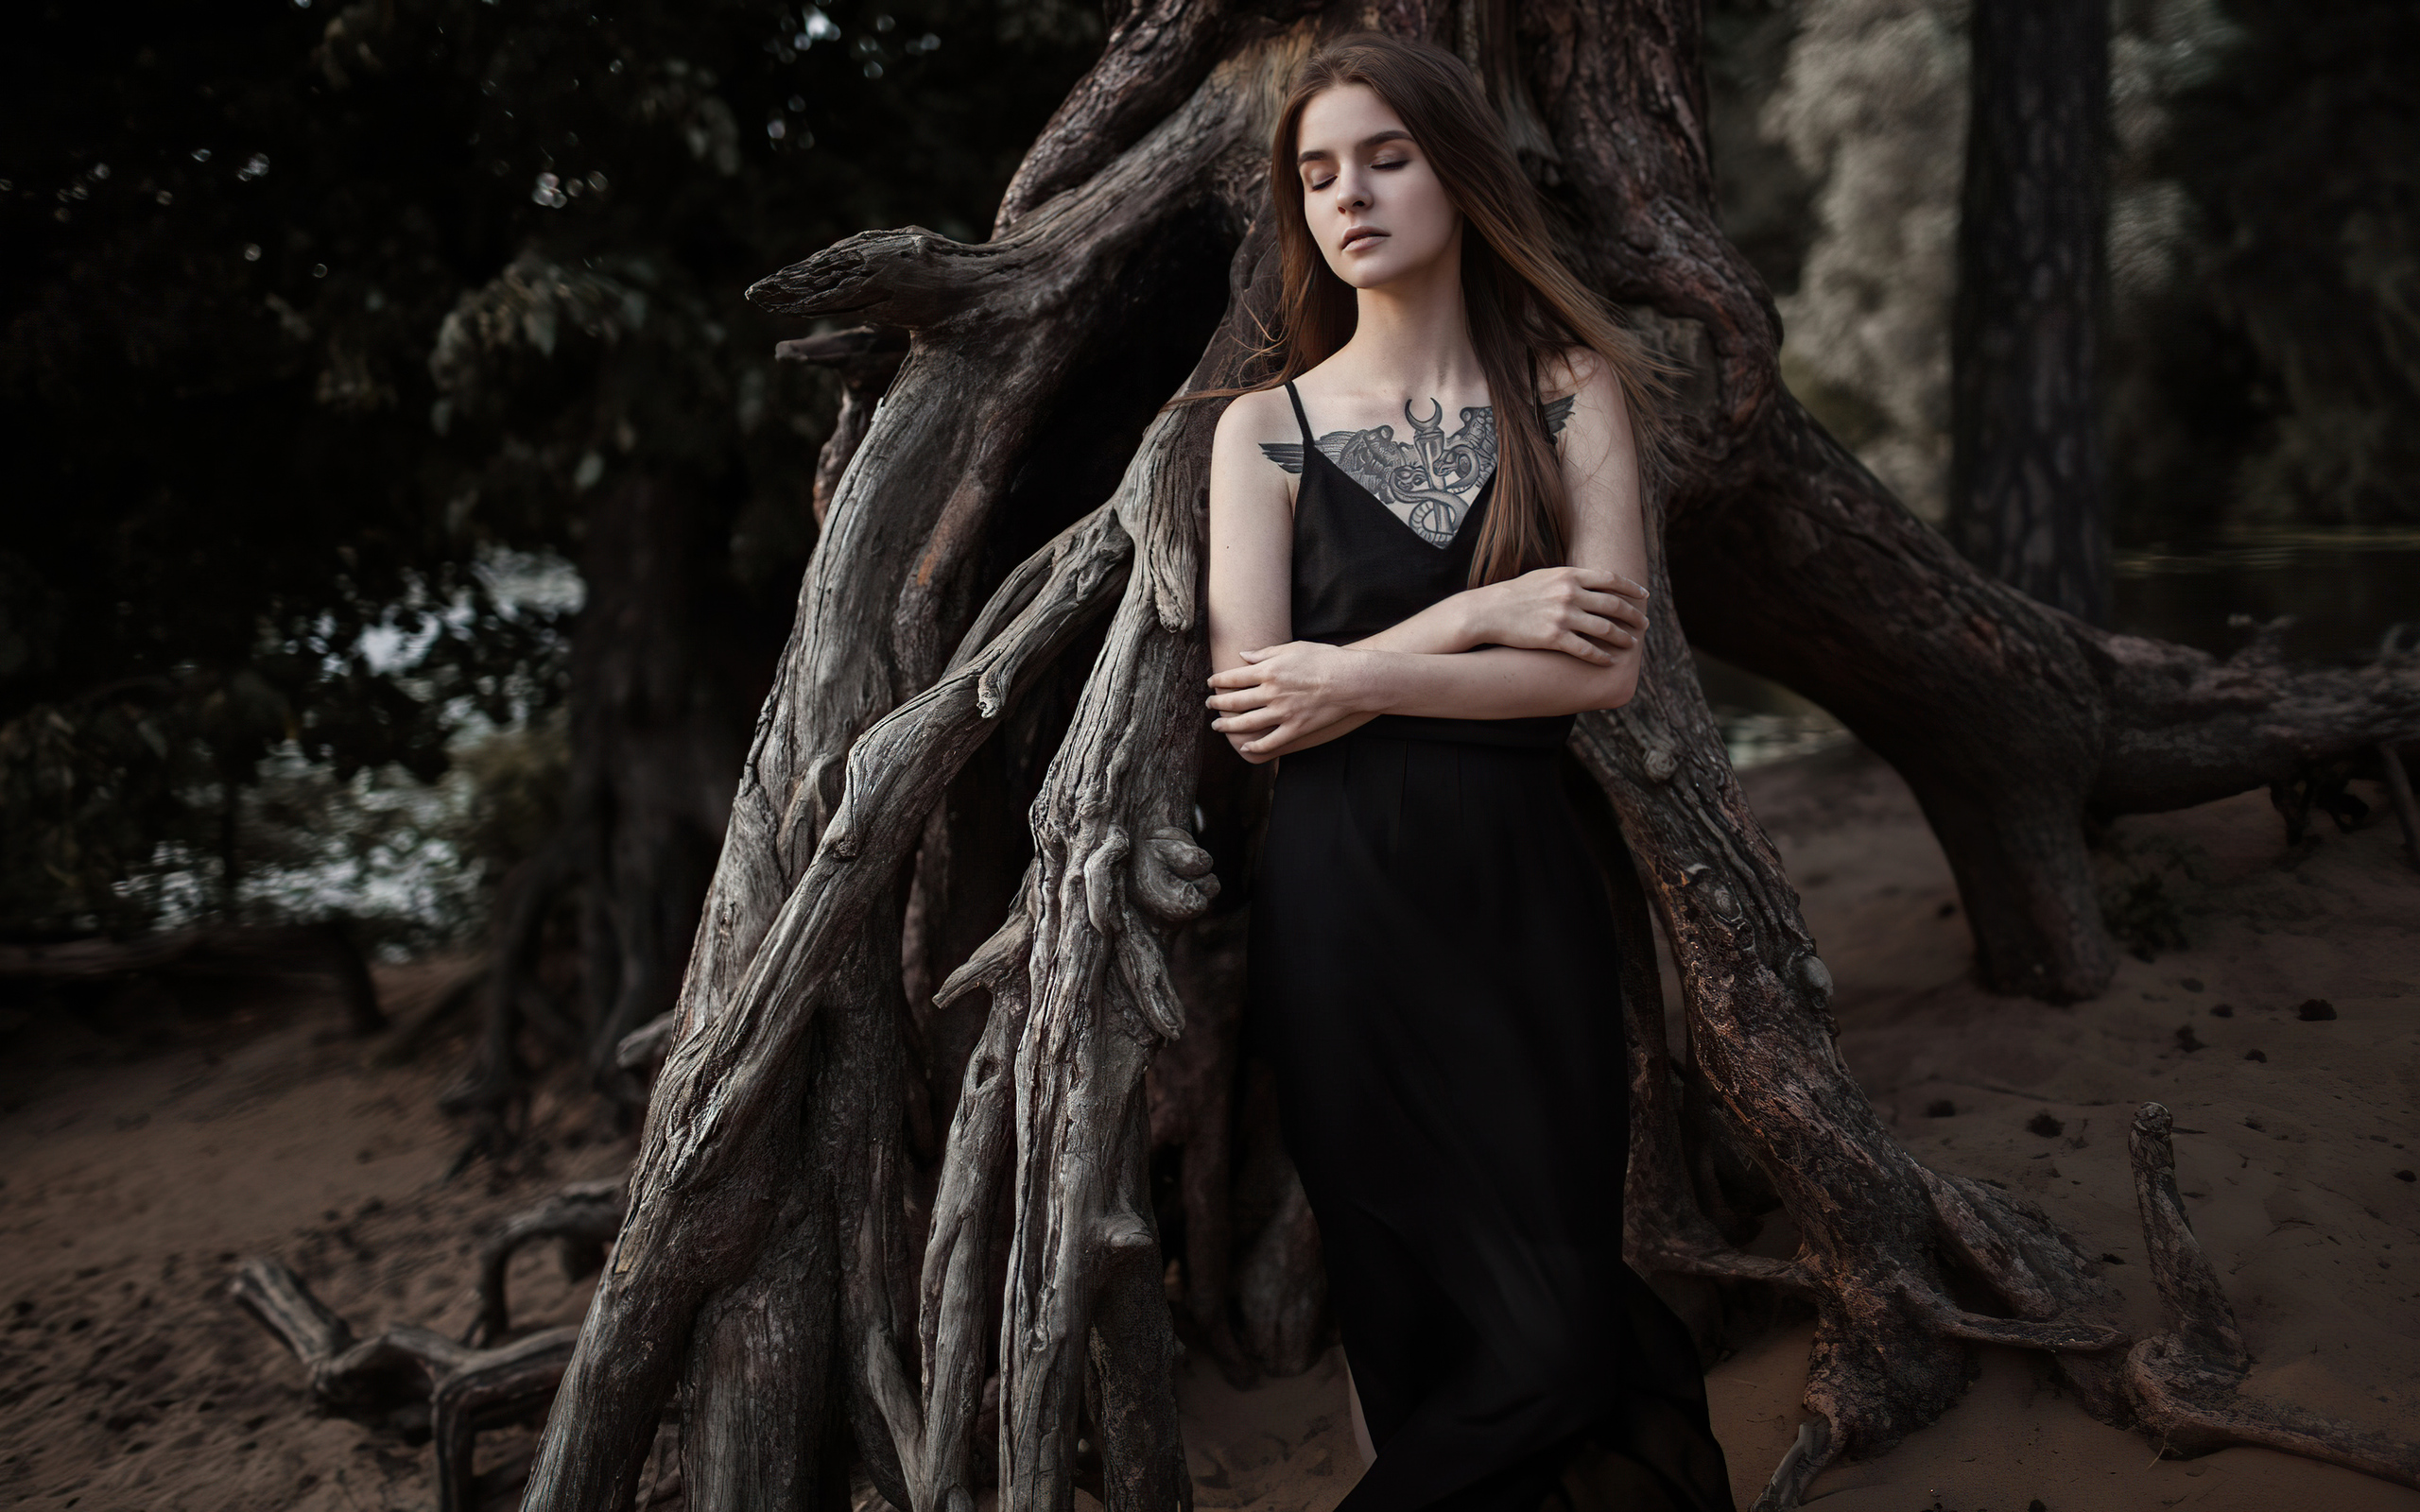 black-dress-girl-closed-eyes-4k-n5.jpg